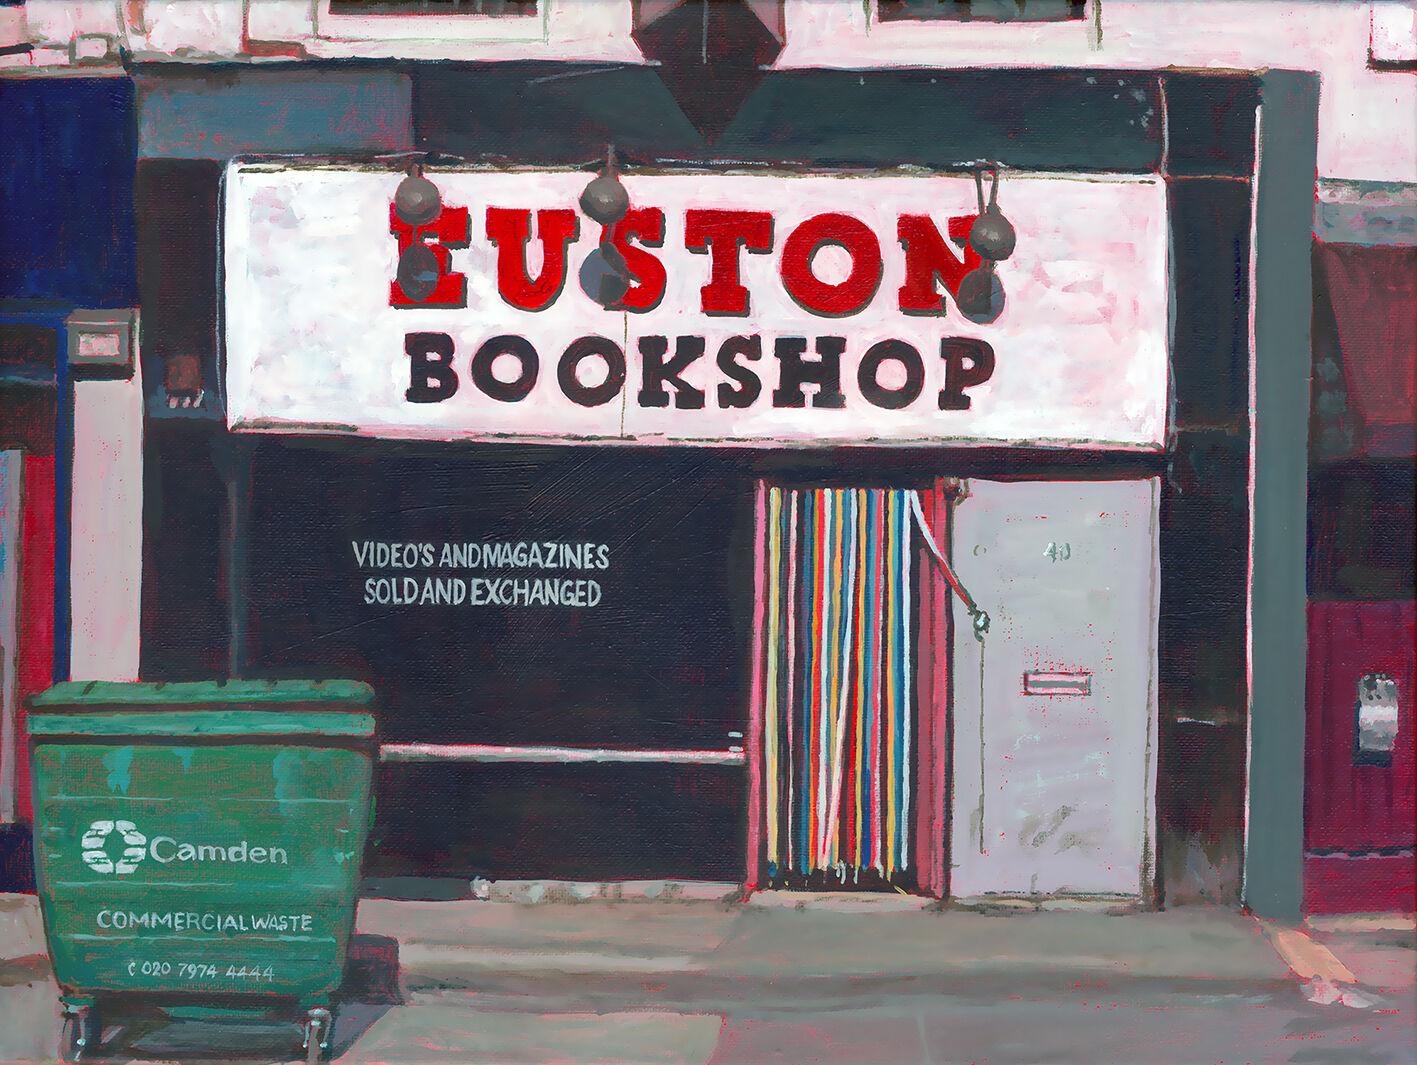 Euston-Bookshop-web